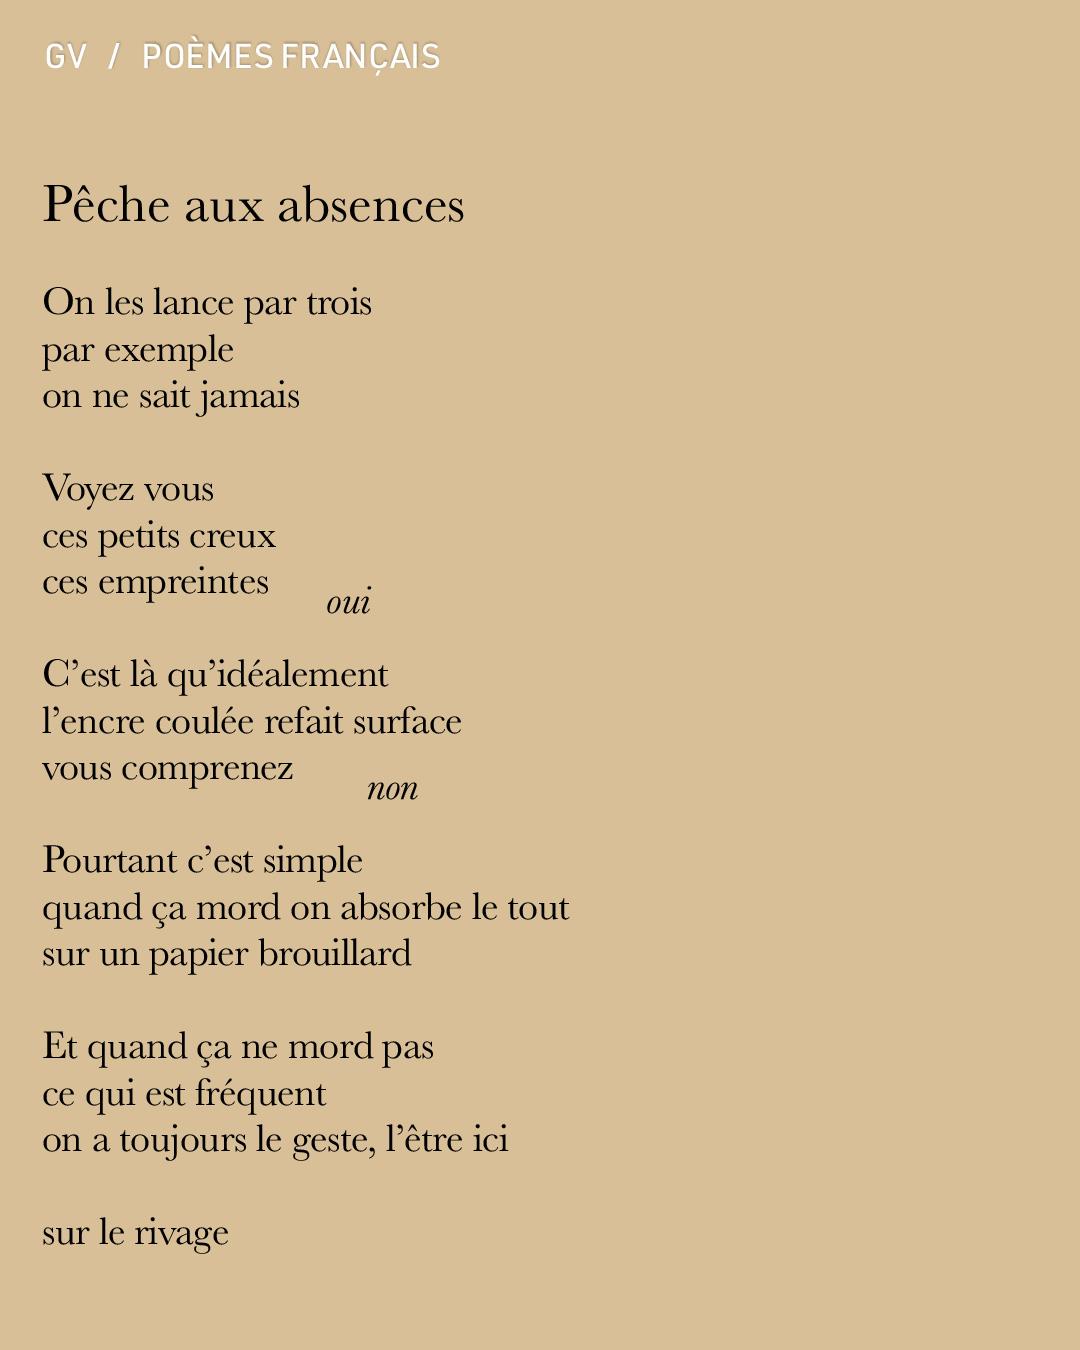 Gvion-PoemesF-PecheAux.jpg